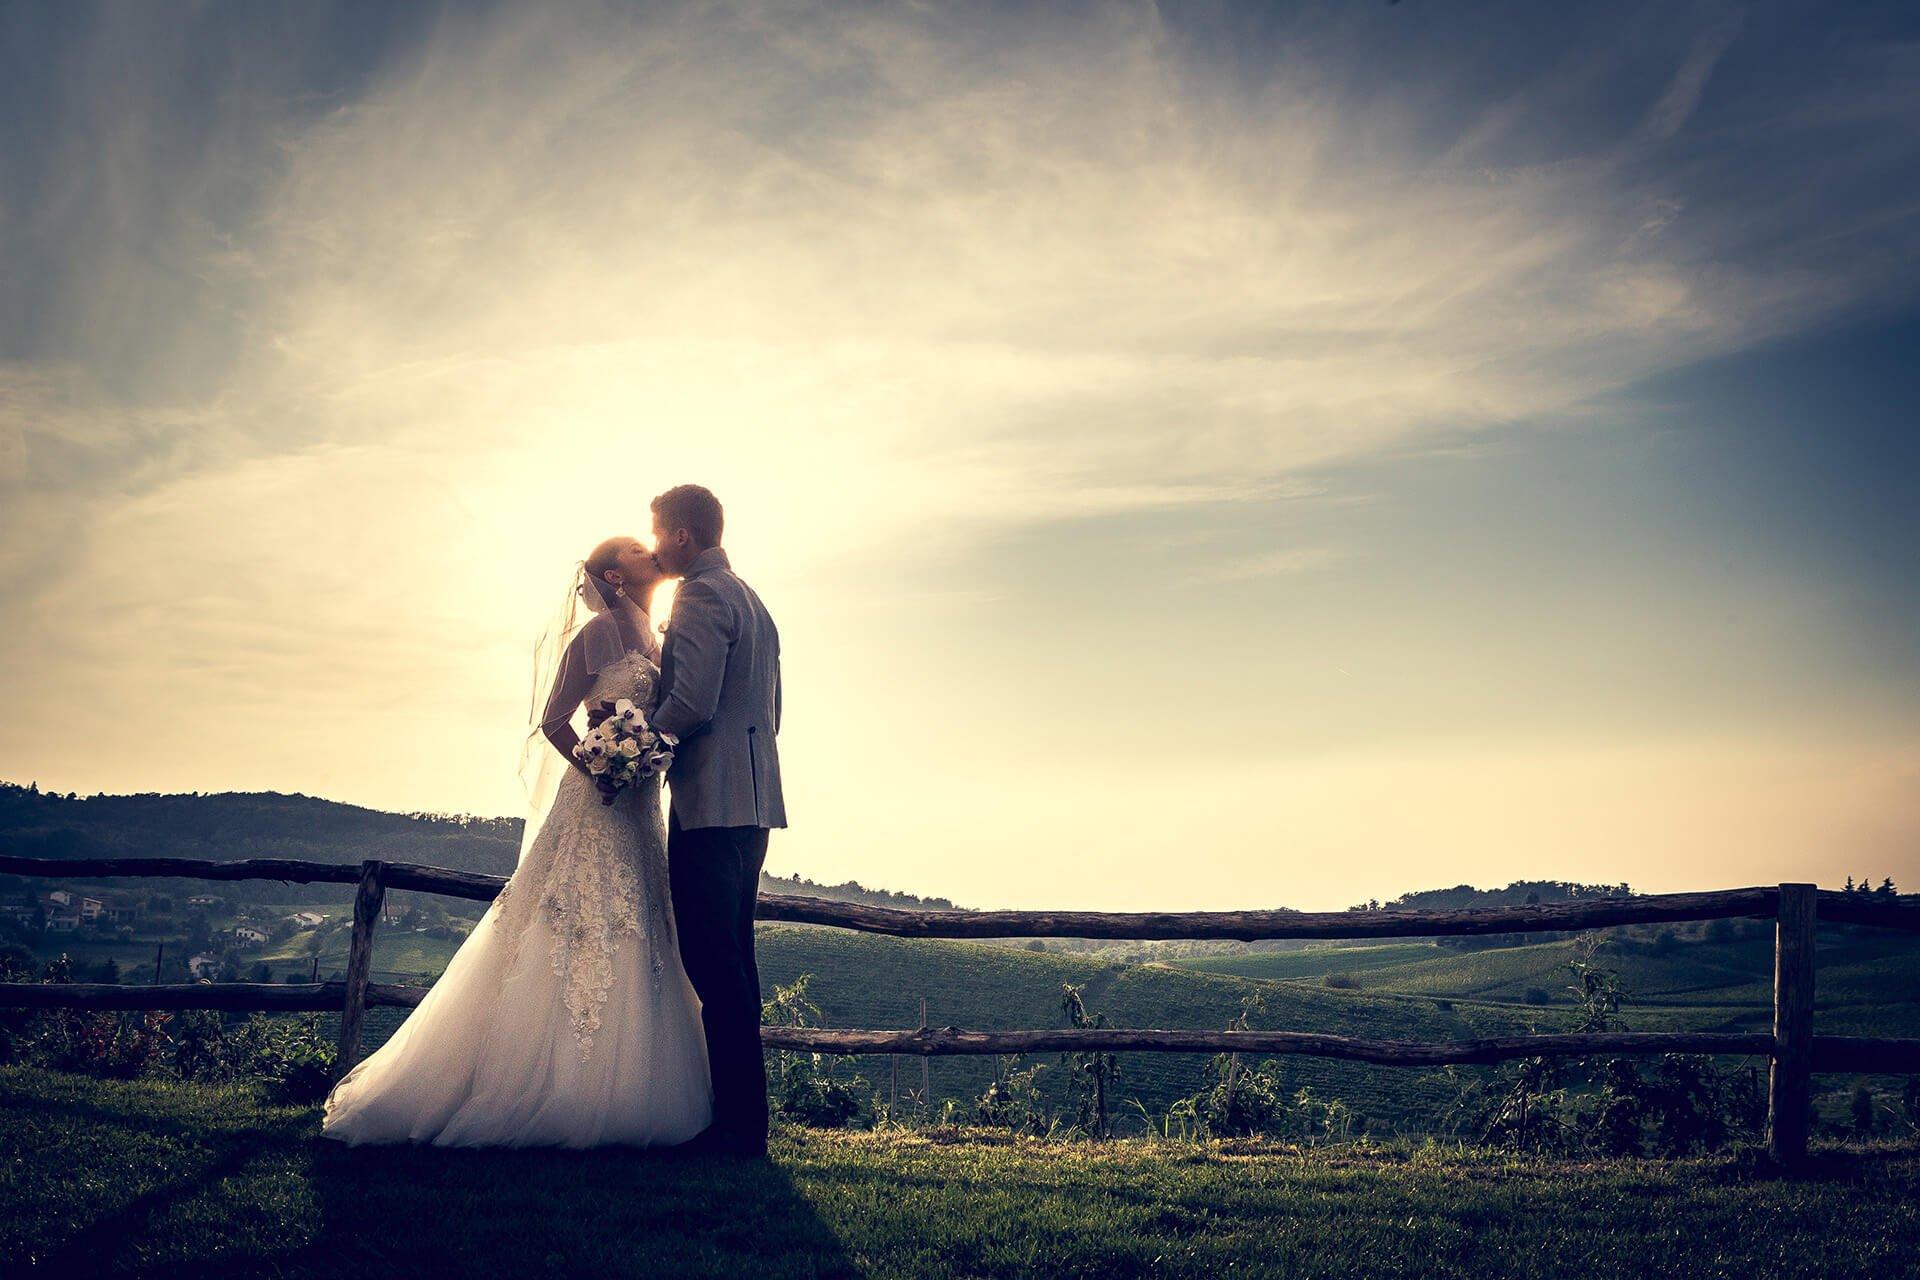 alain battiloro fotografo matrimonio 029 villa sparina gavi